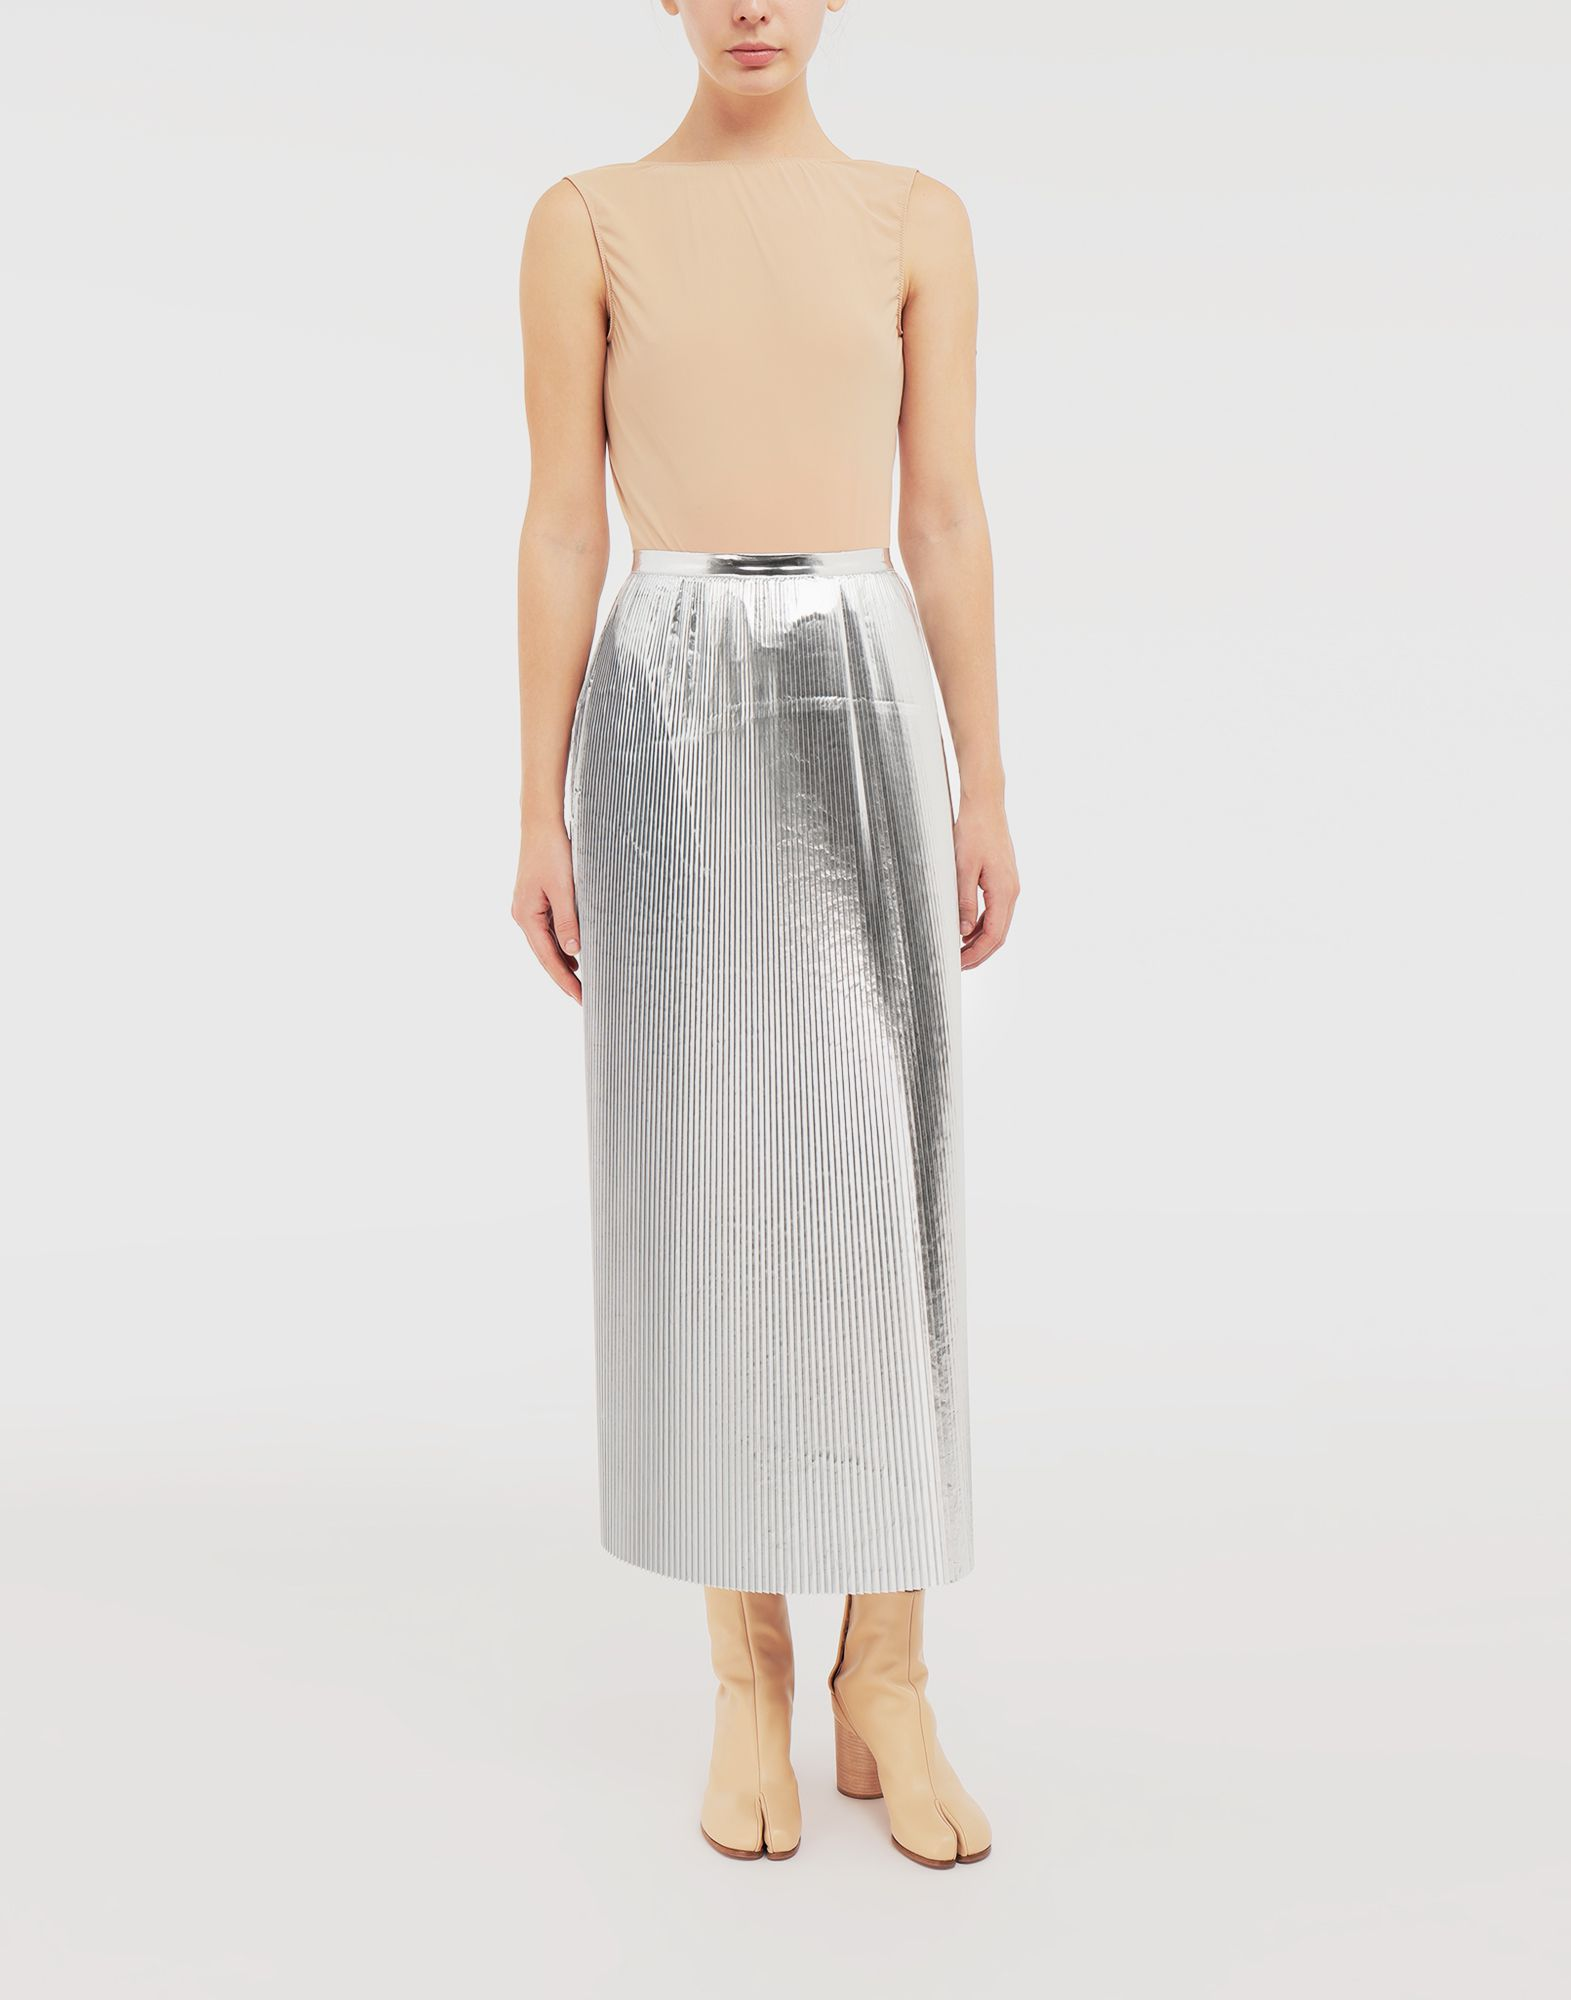 MAISON MARGIELA Silver pleated nylon skirt 3/4 length skirt Woman d